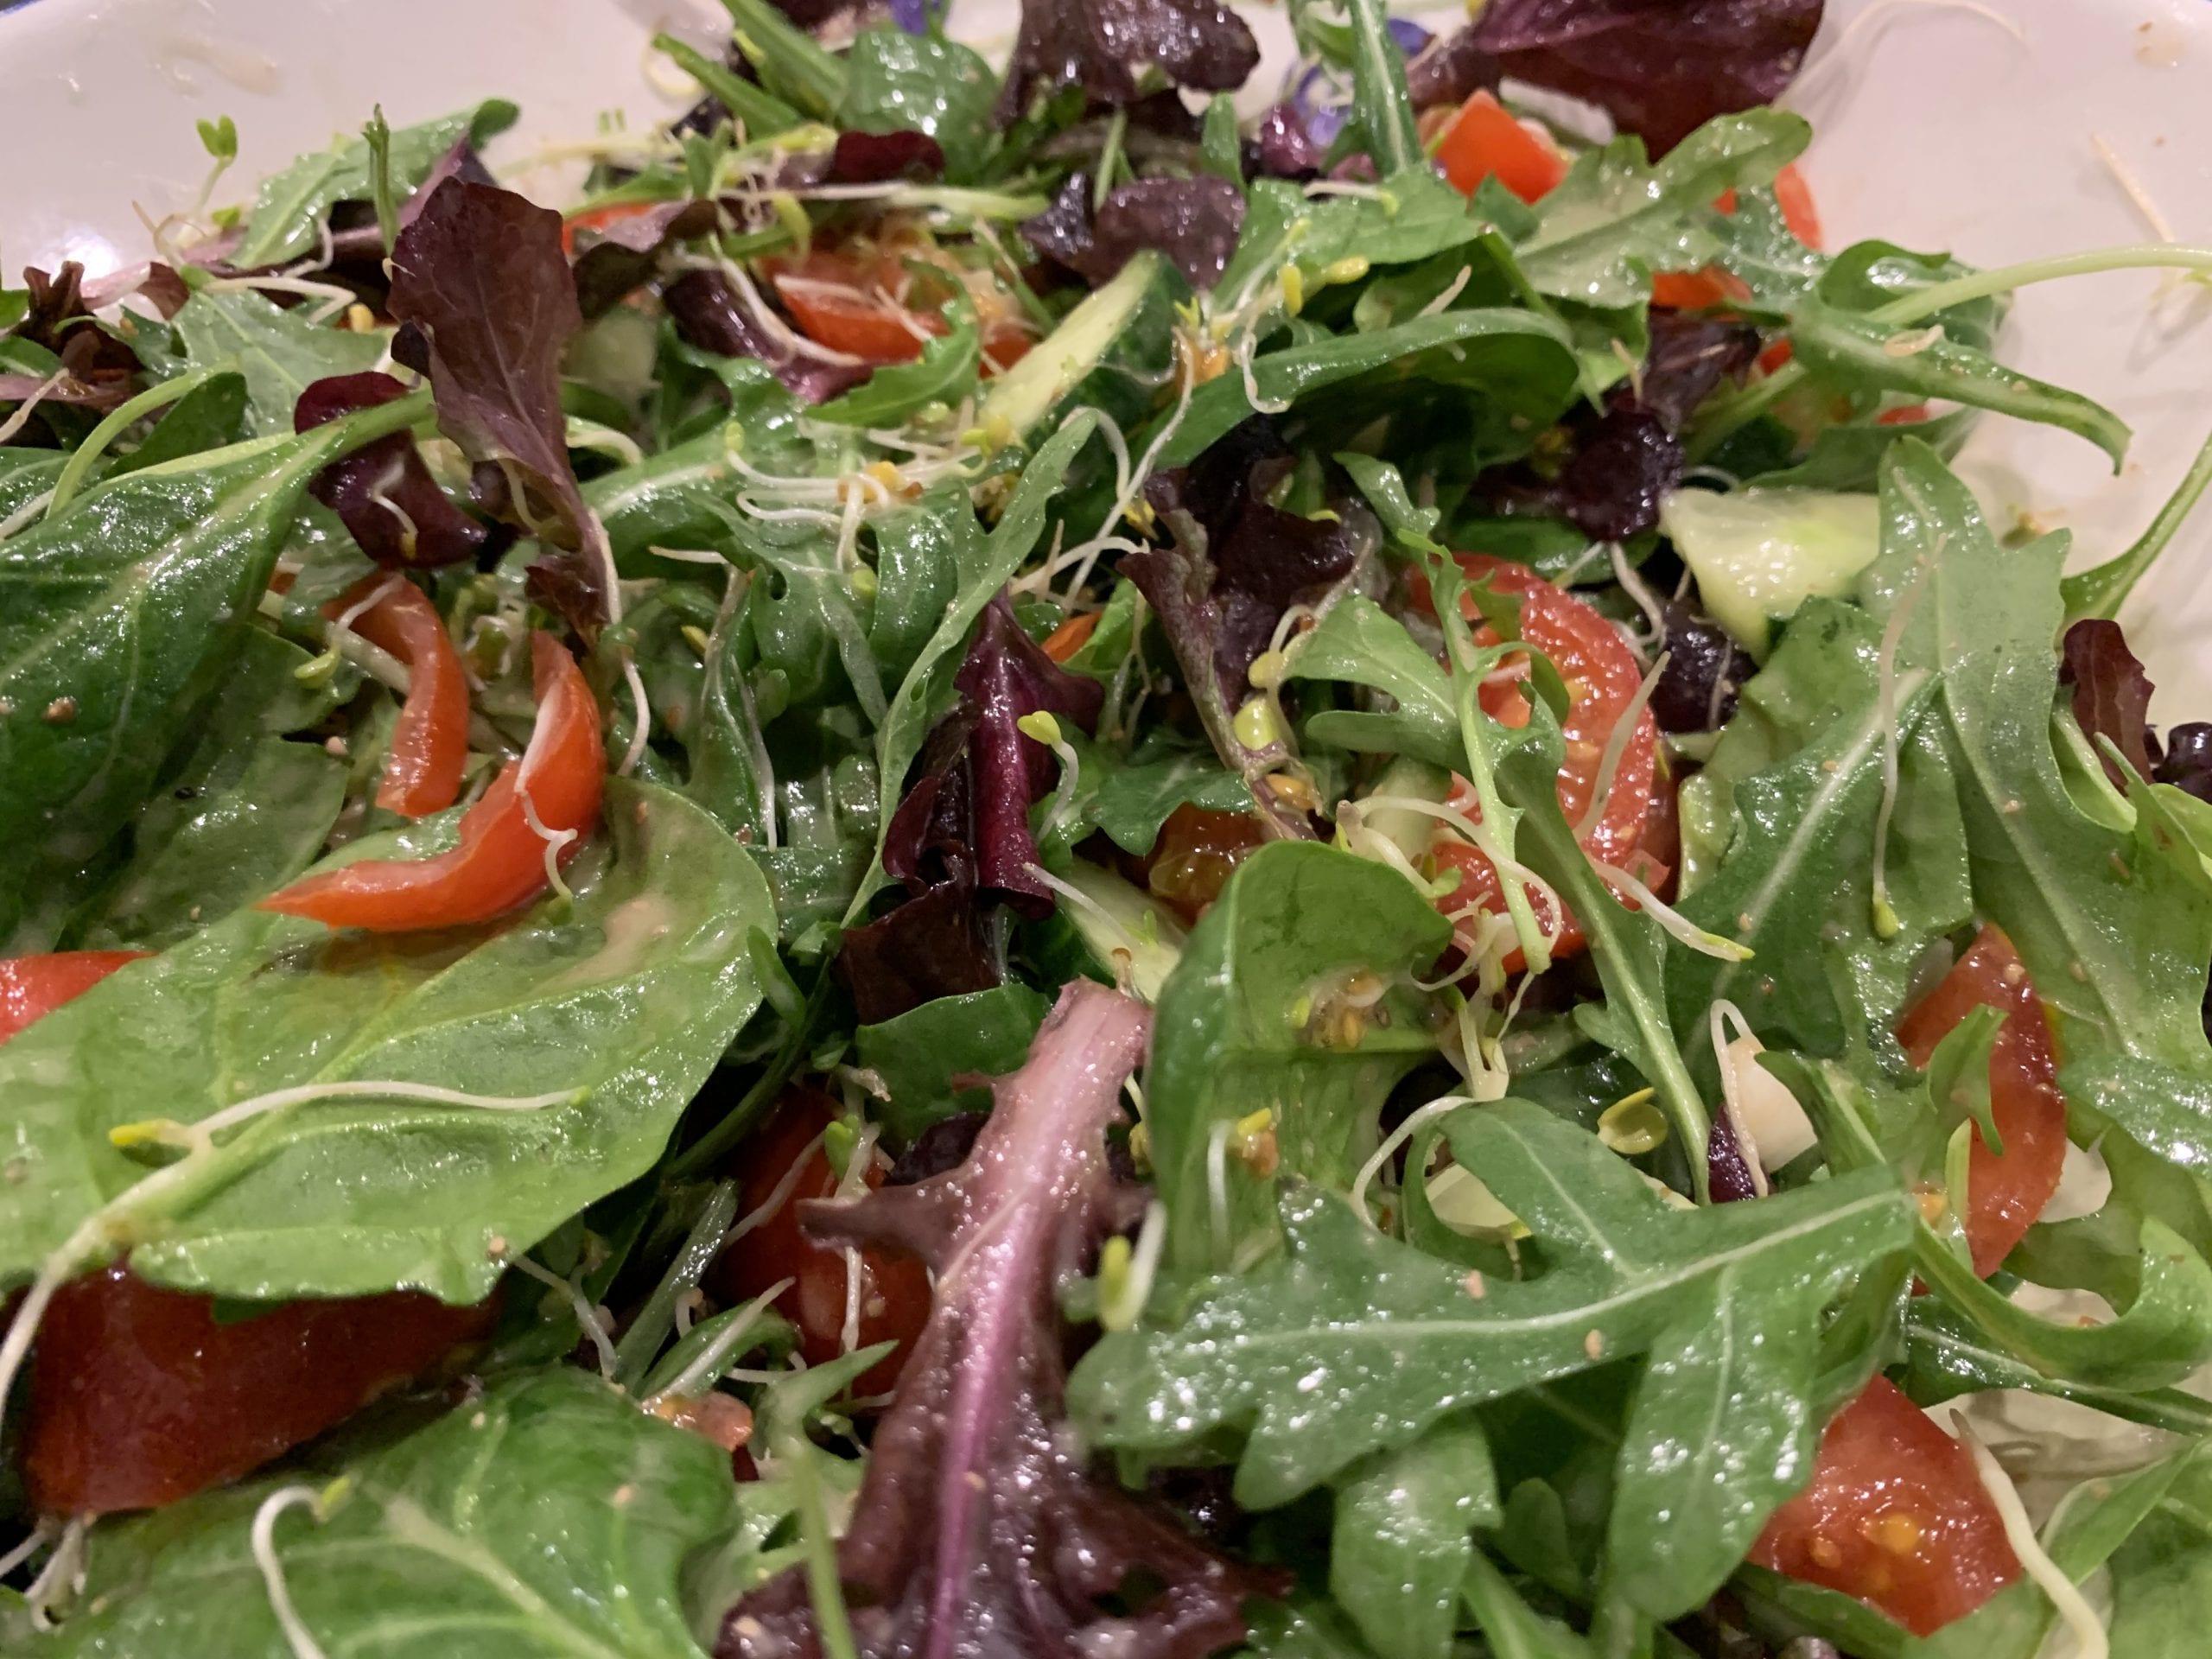 french salad dressing on salad